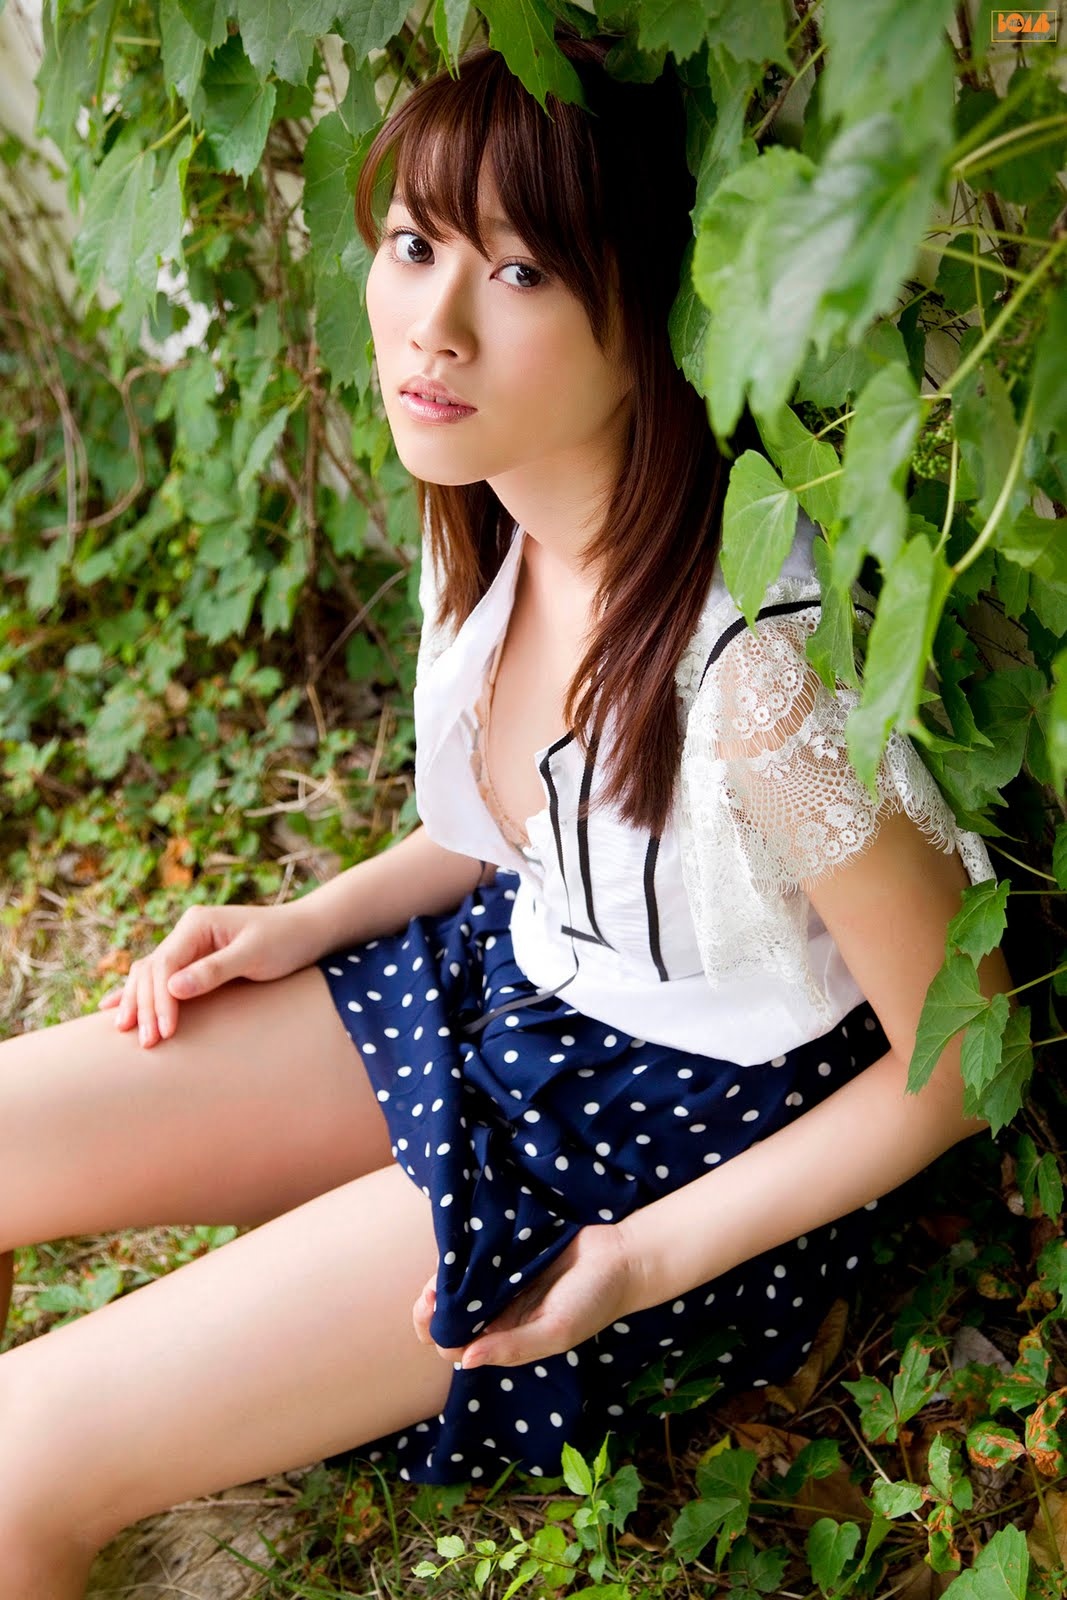 Ayaka Noda ASiAN GiRLS Pinteres Pic 17 of 35